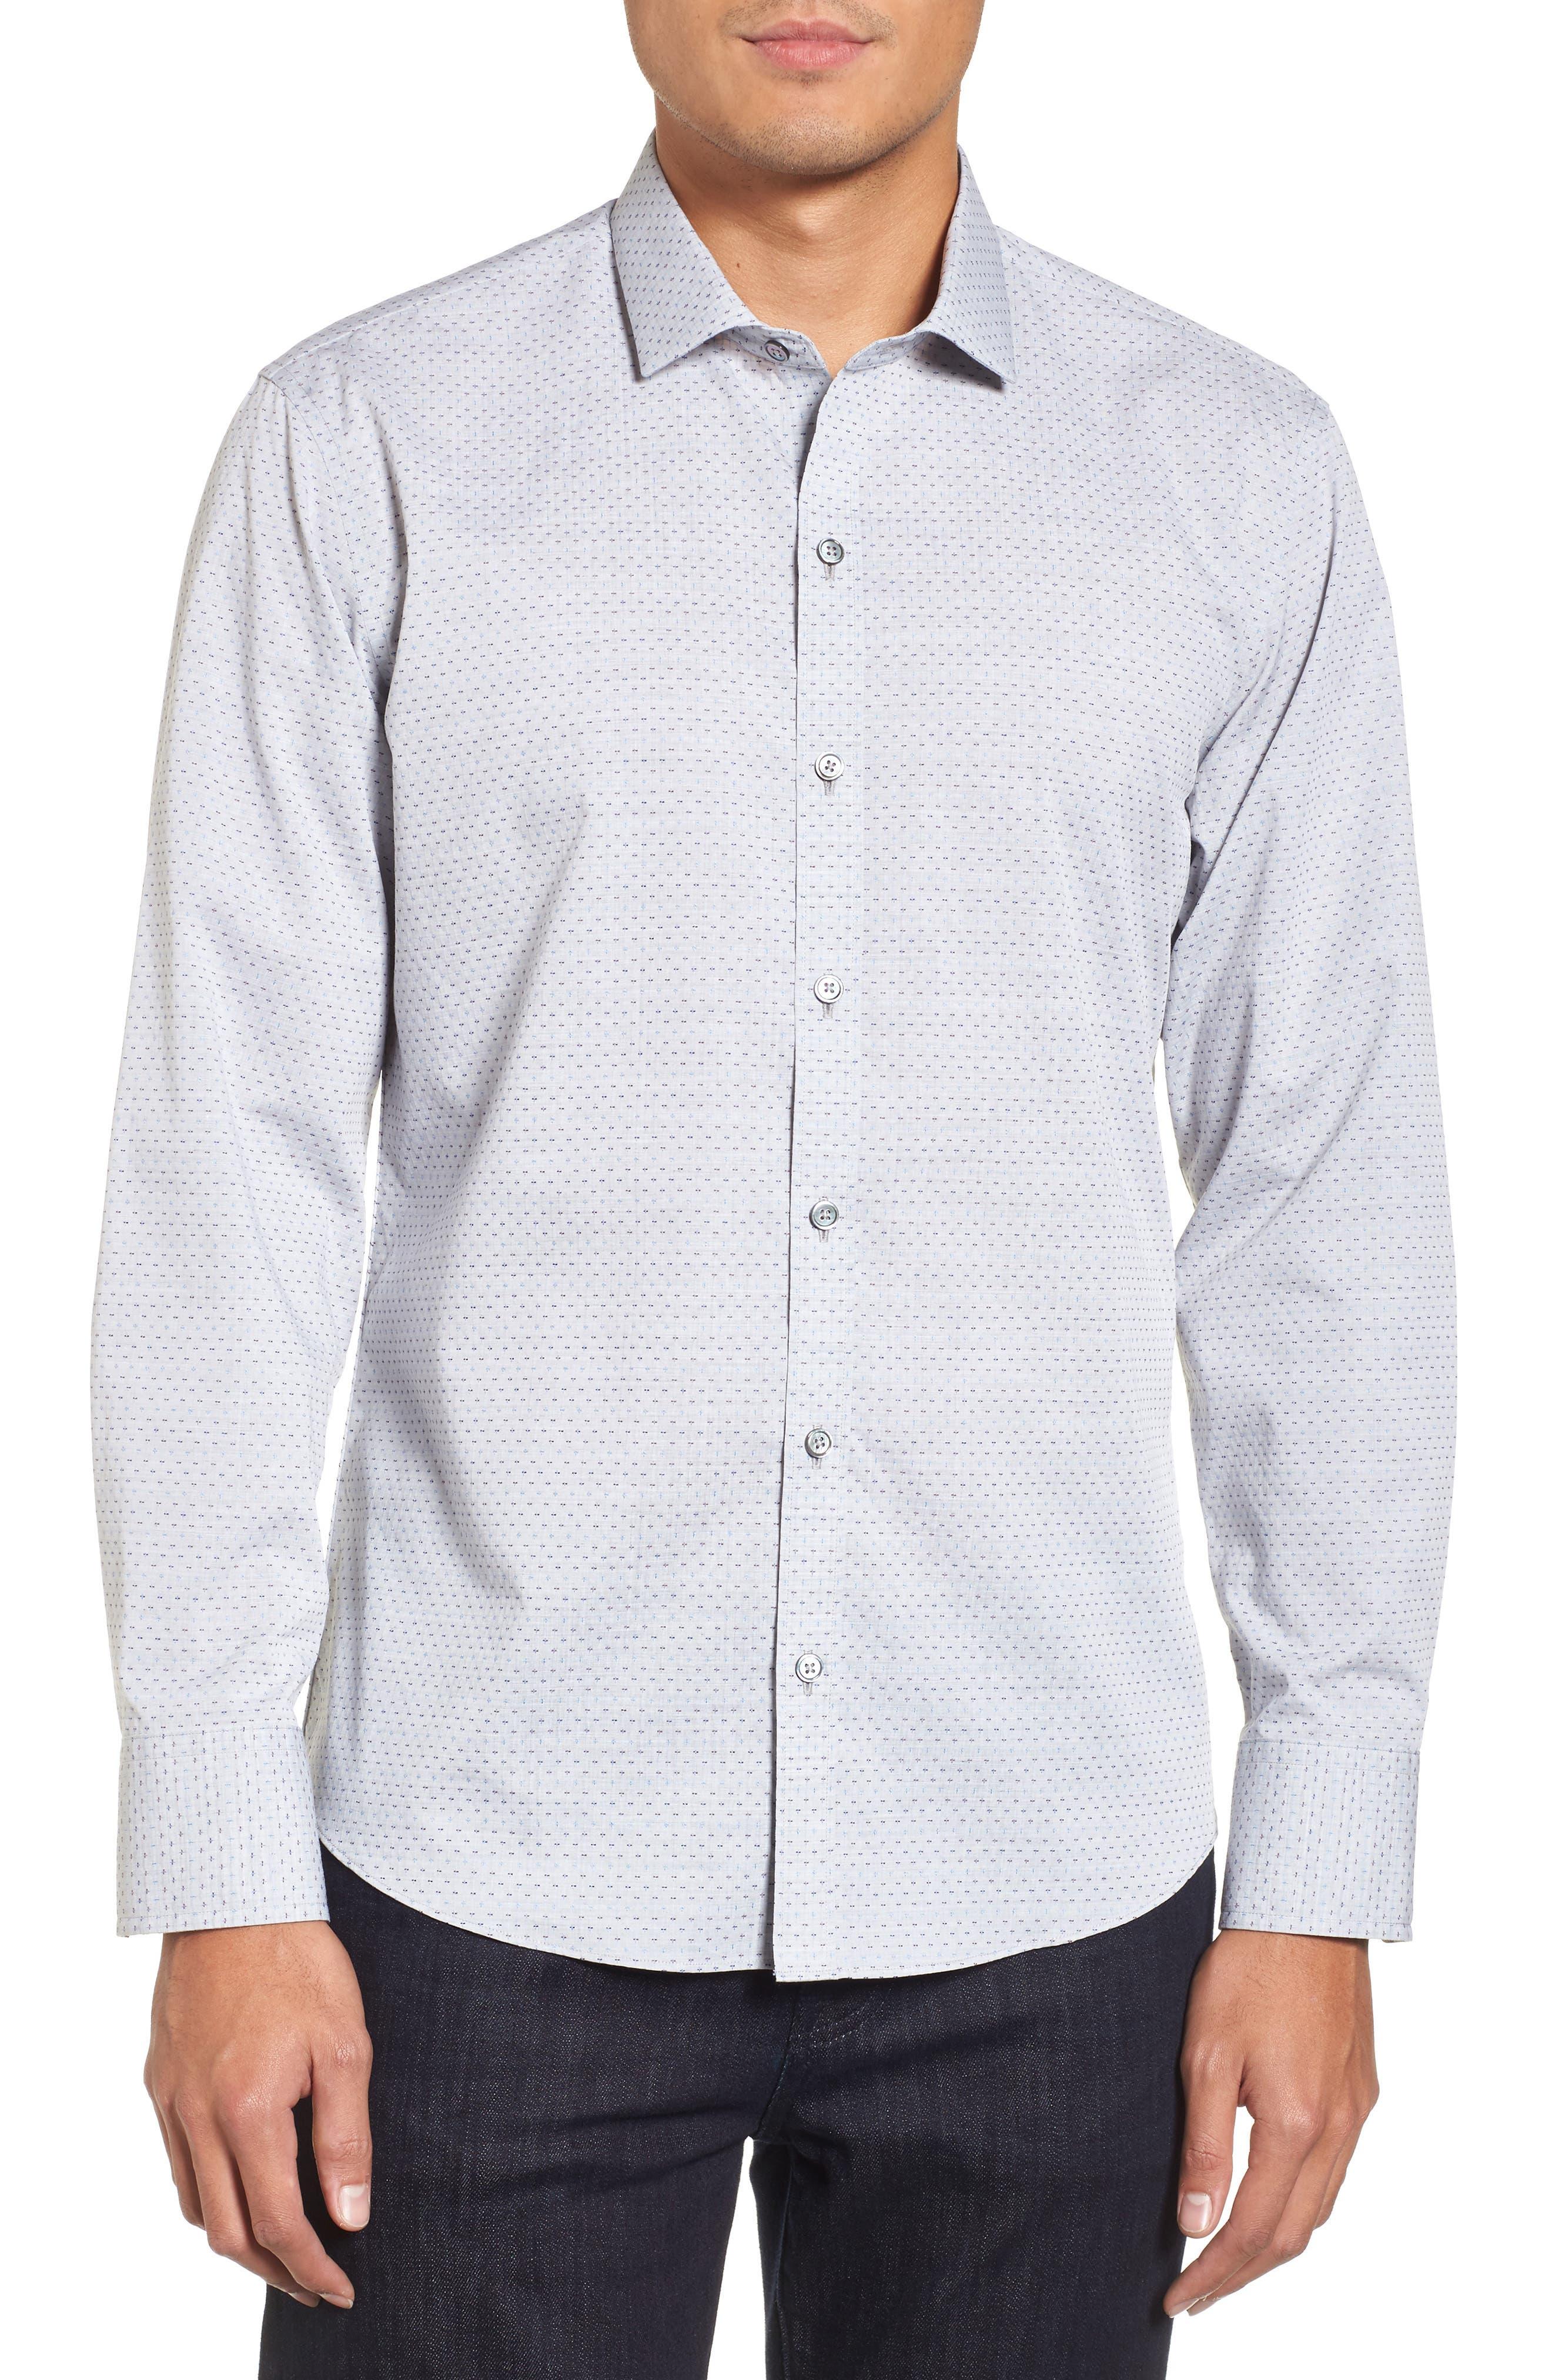 Atila Slim Fit Dobby Woven Sport Shirt,                         Main,                         color, Light Grey